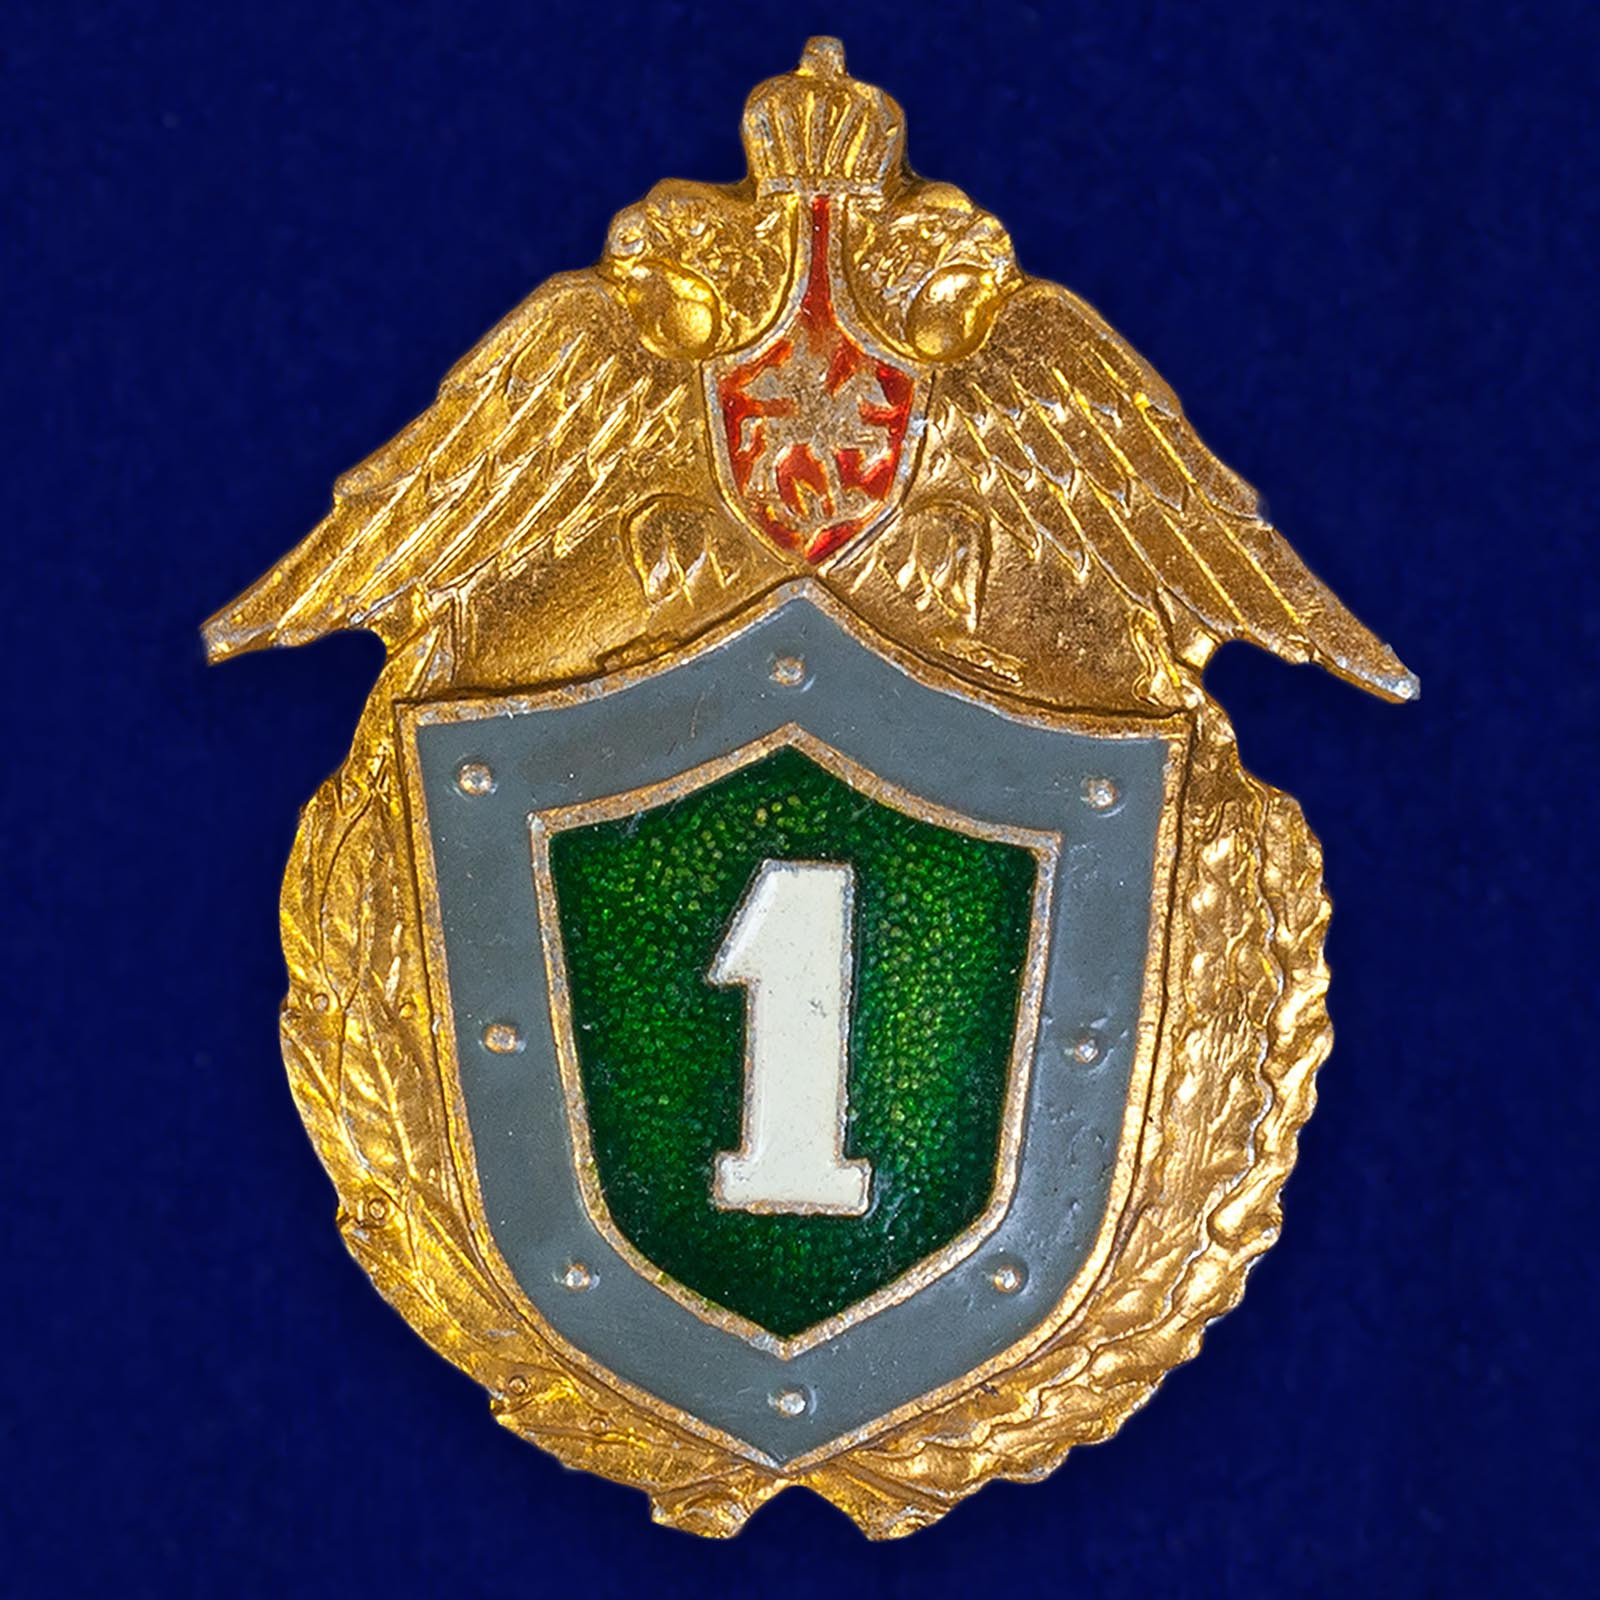 Знак ФПС РФ Специалист 1-го класса в бархатном футляре - Аверс